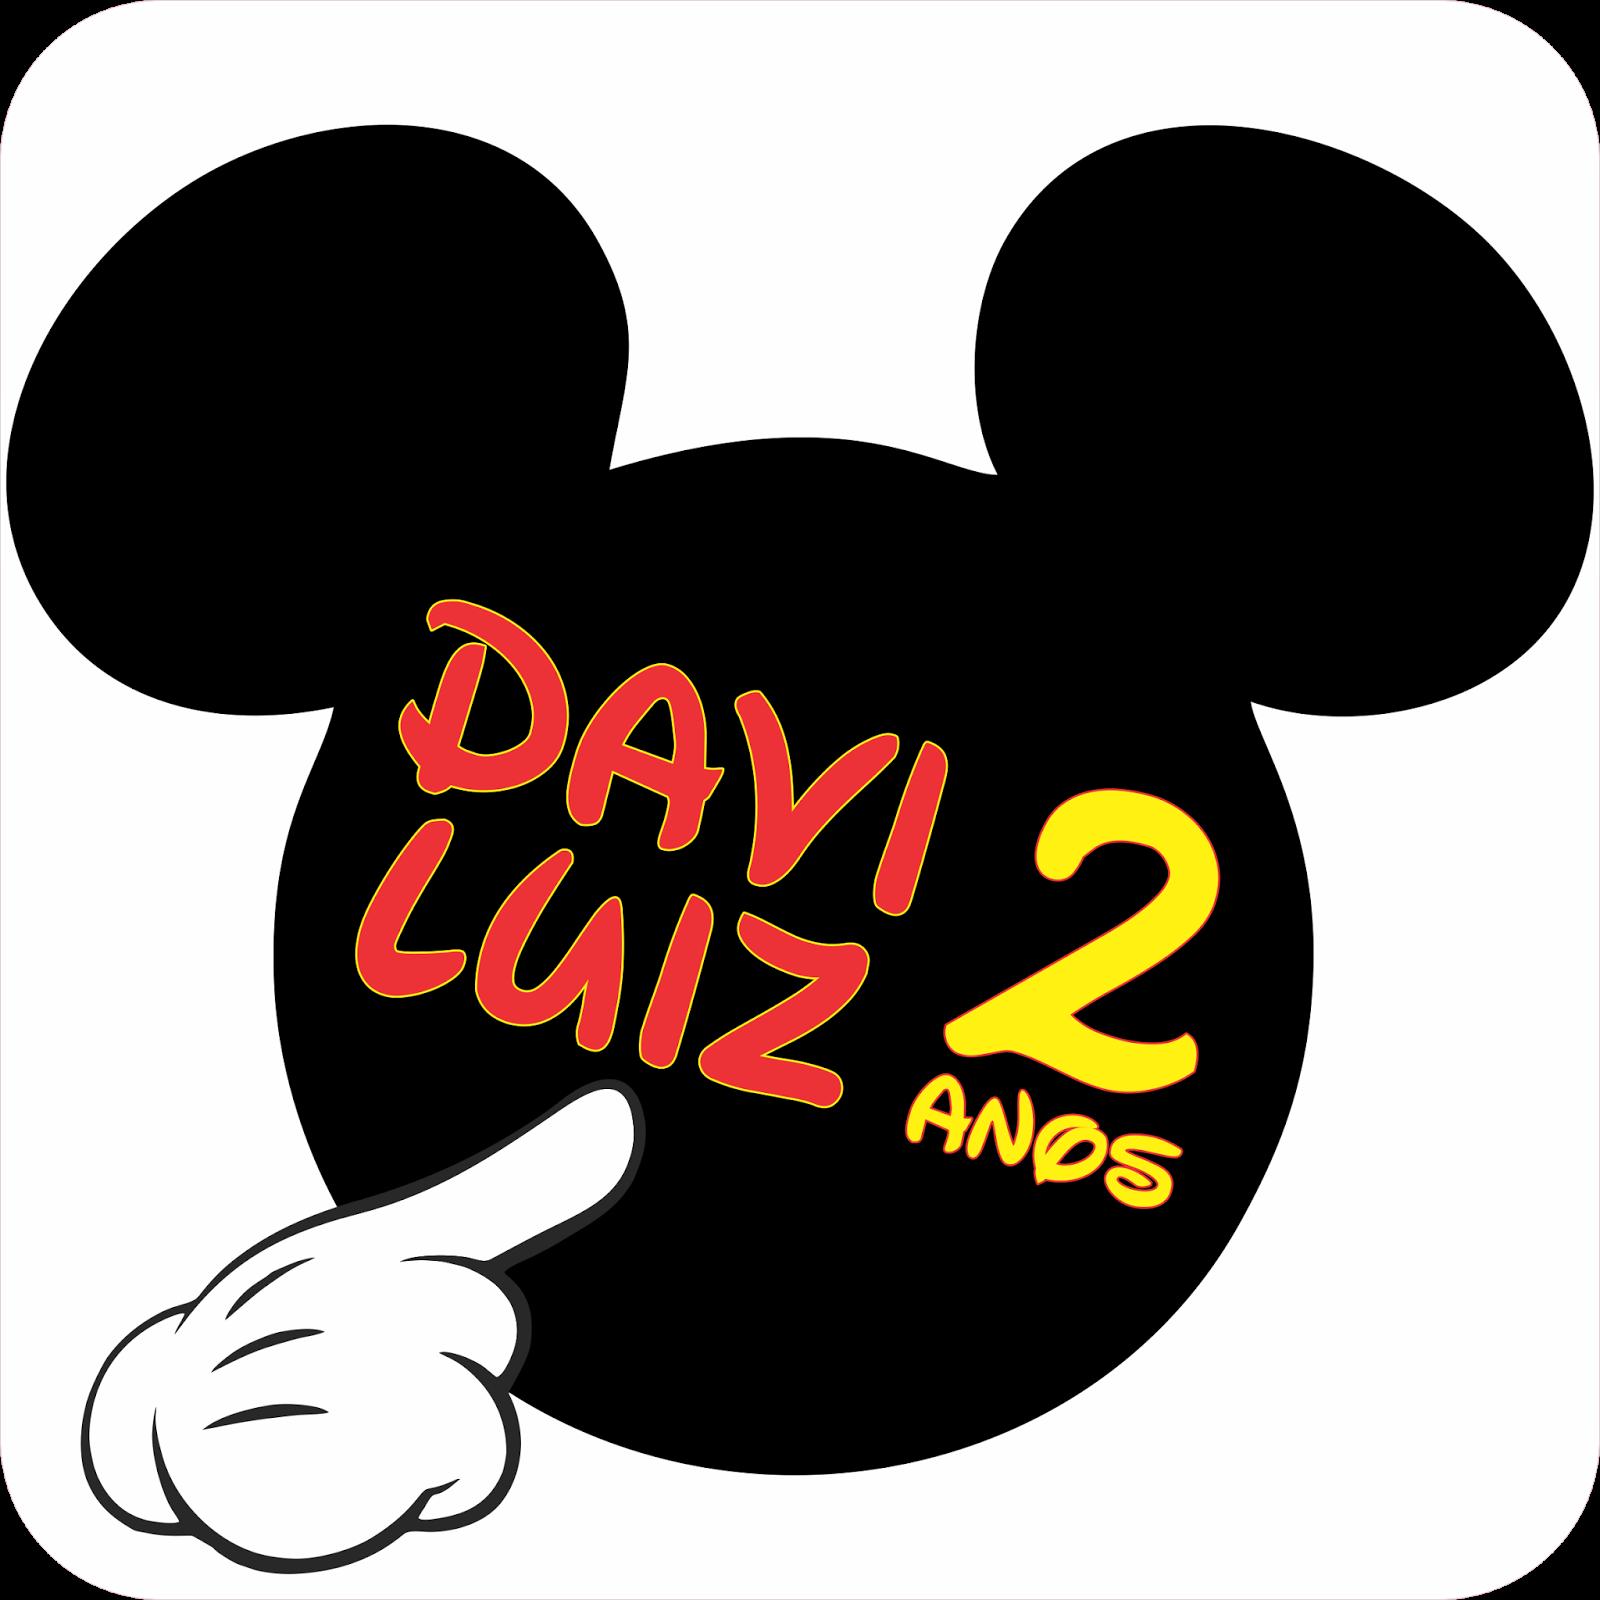 https://fruipartis.blogspot.com.br/2017/04/mickey-davi-luiz.html